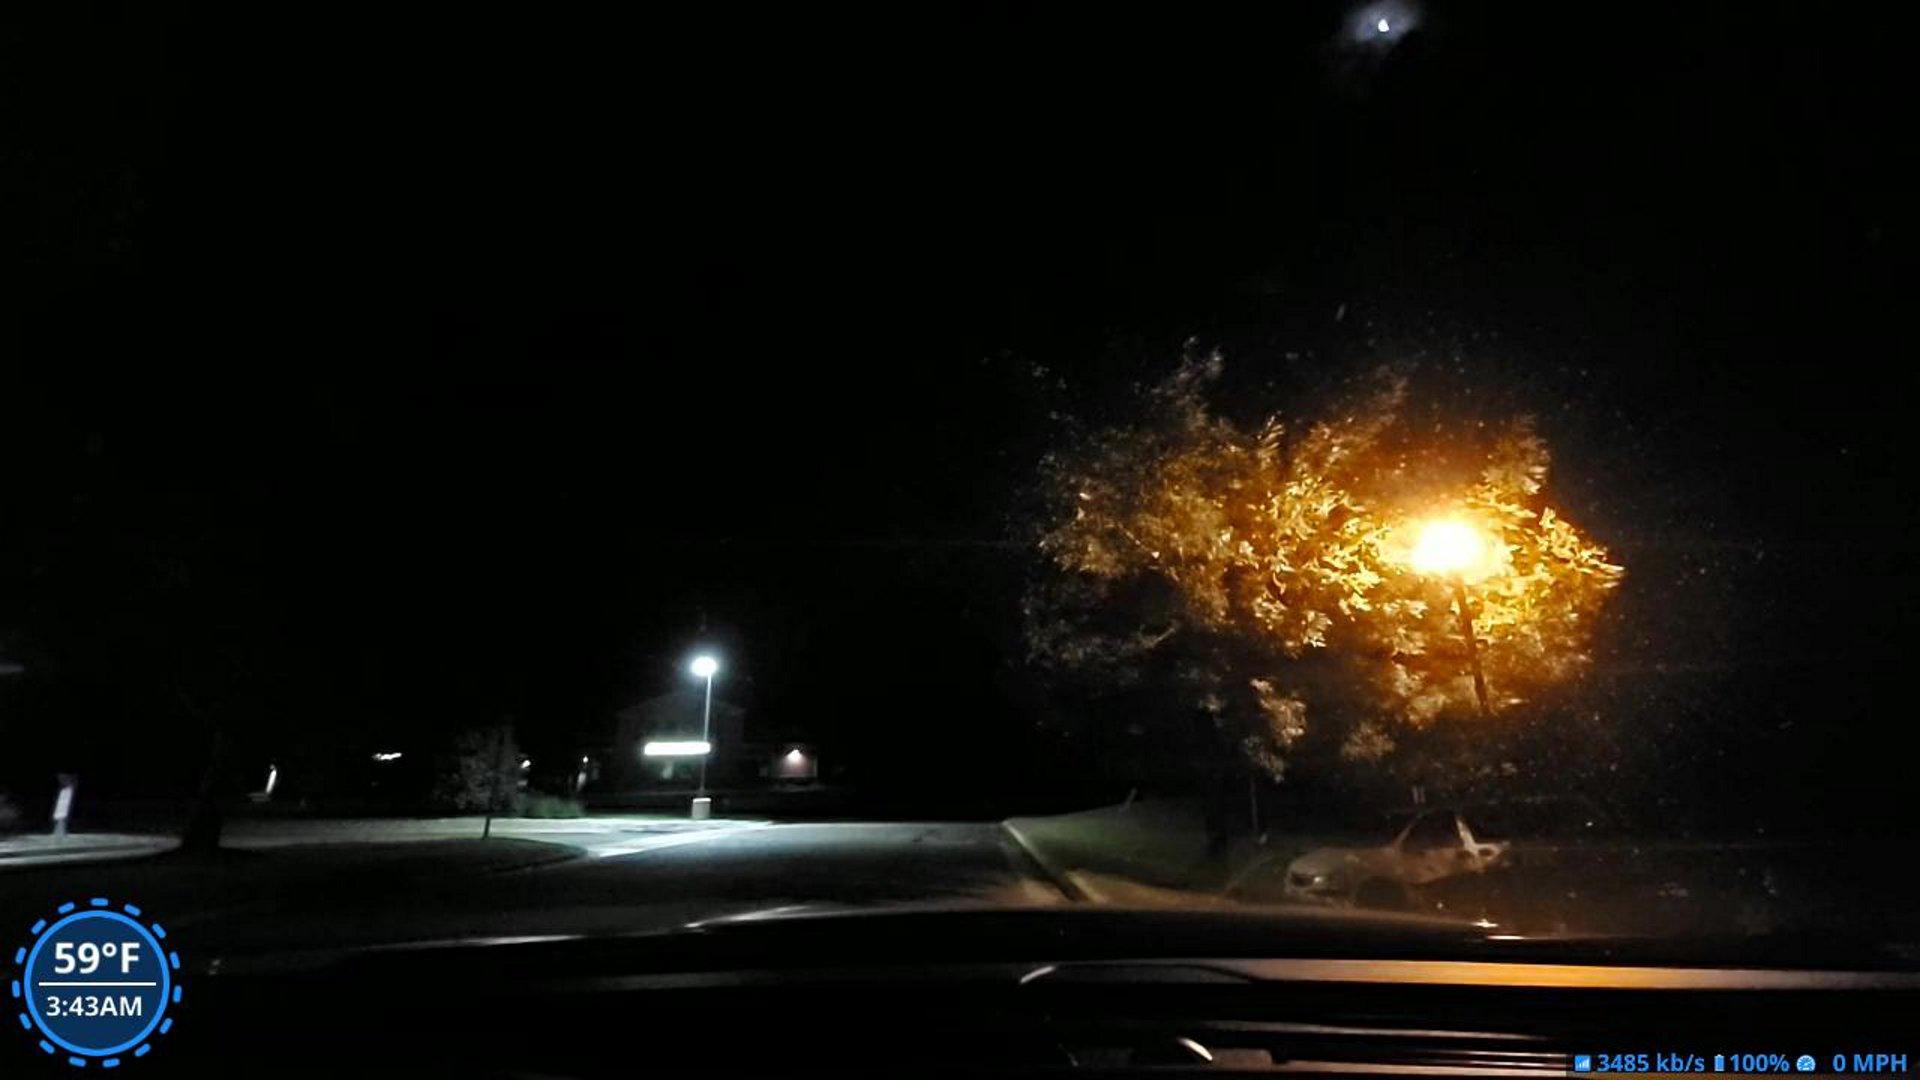 the-late-shift-uber-lyft-discord-bttv-sub-donate-luv-travel-outdoors-0259-https-t-co-yjzxgrwfwy-https-t-co-qjpv38glje